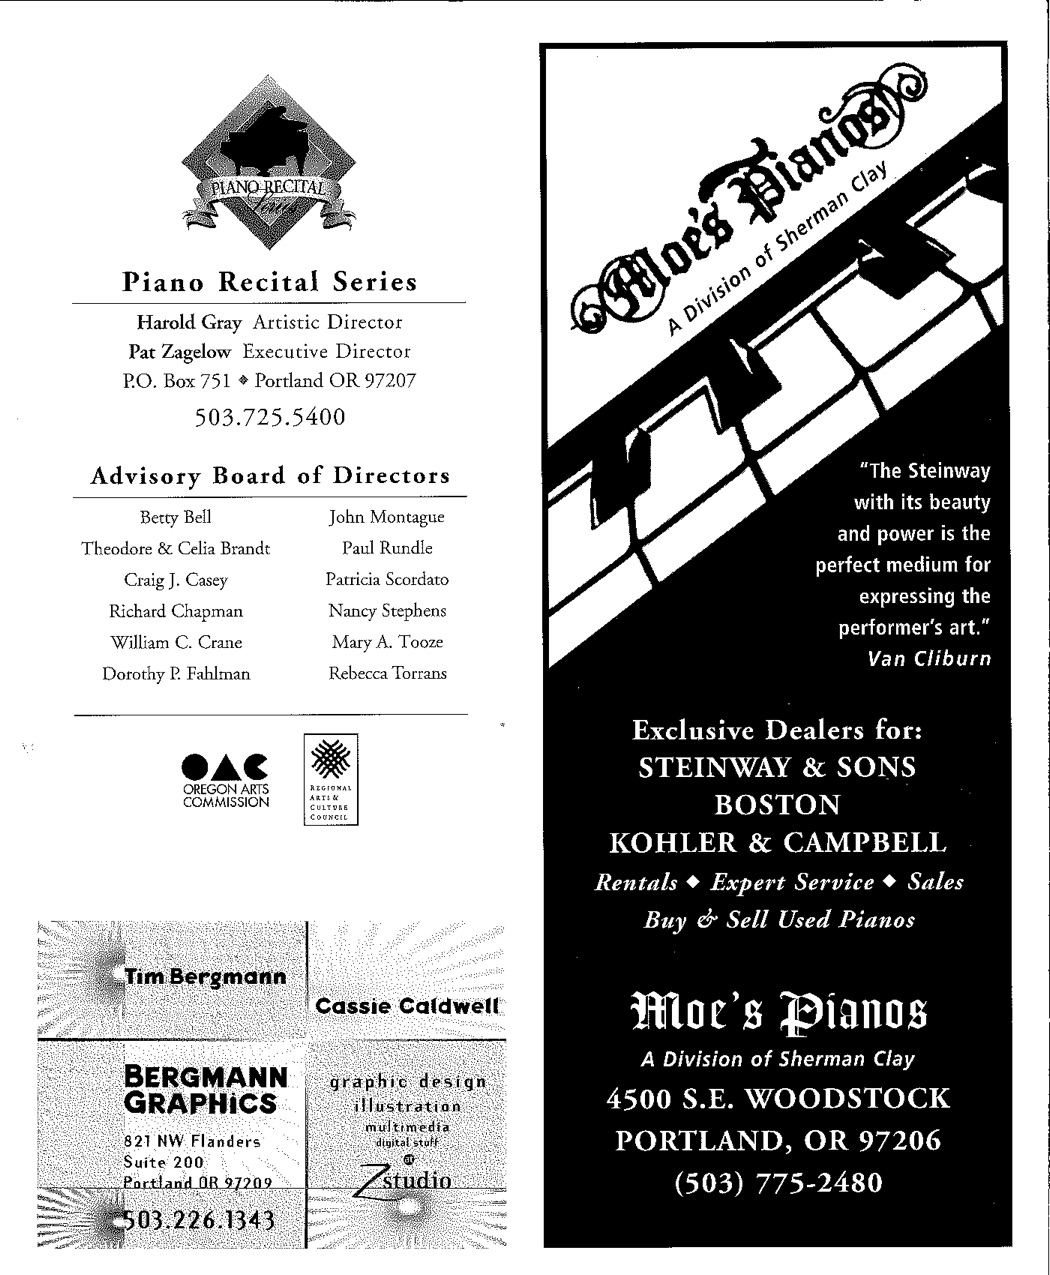 Berman96-97_Program6.jpg